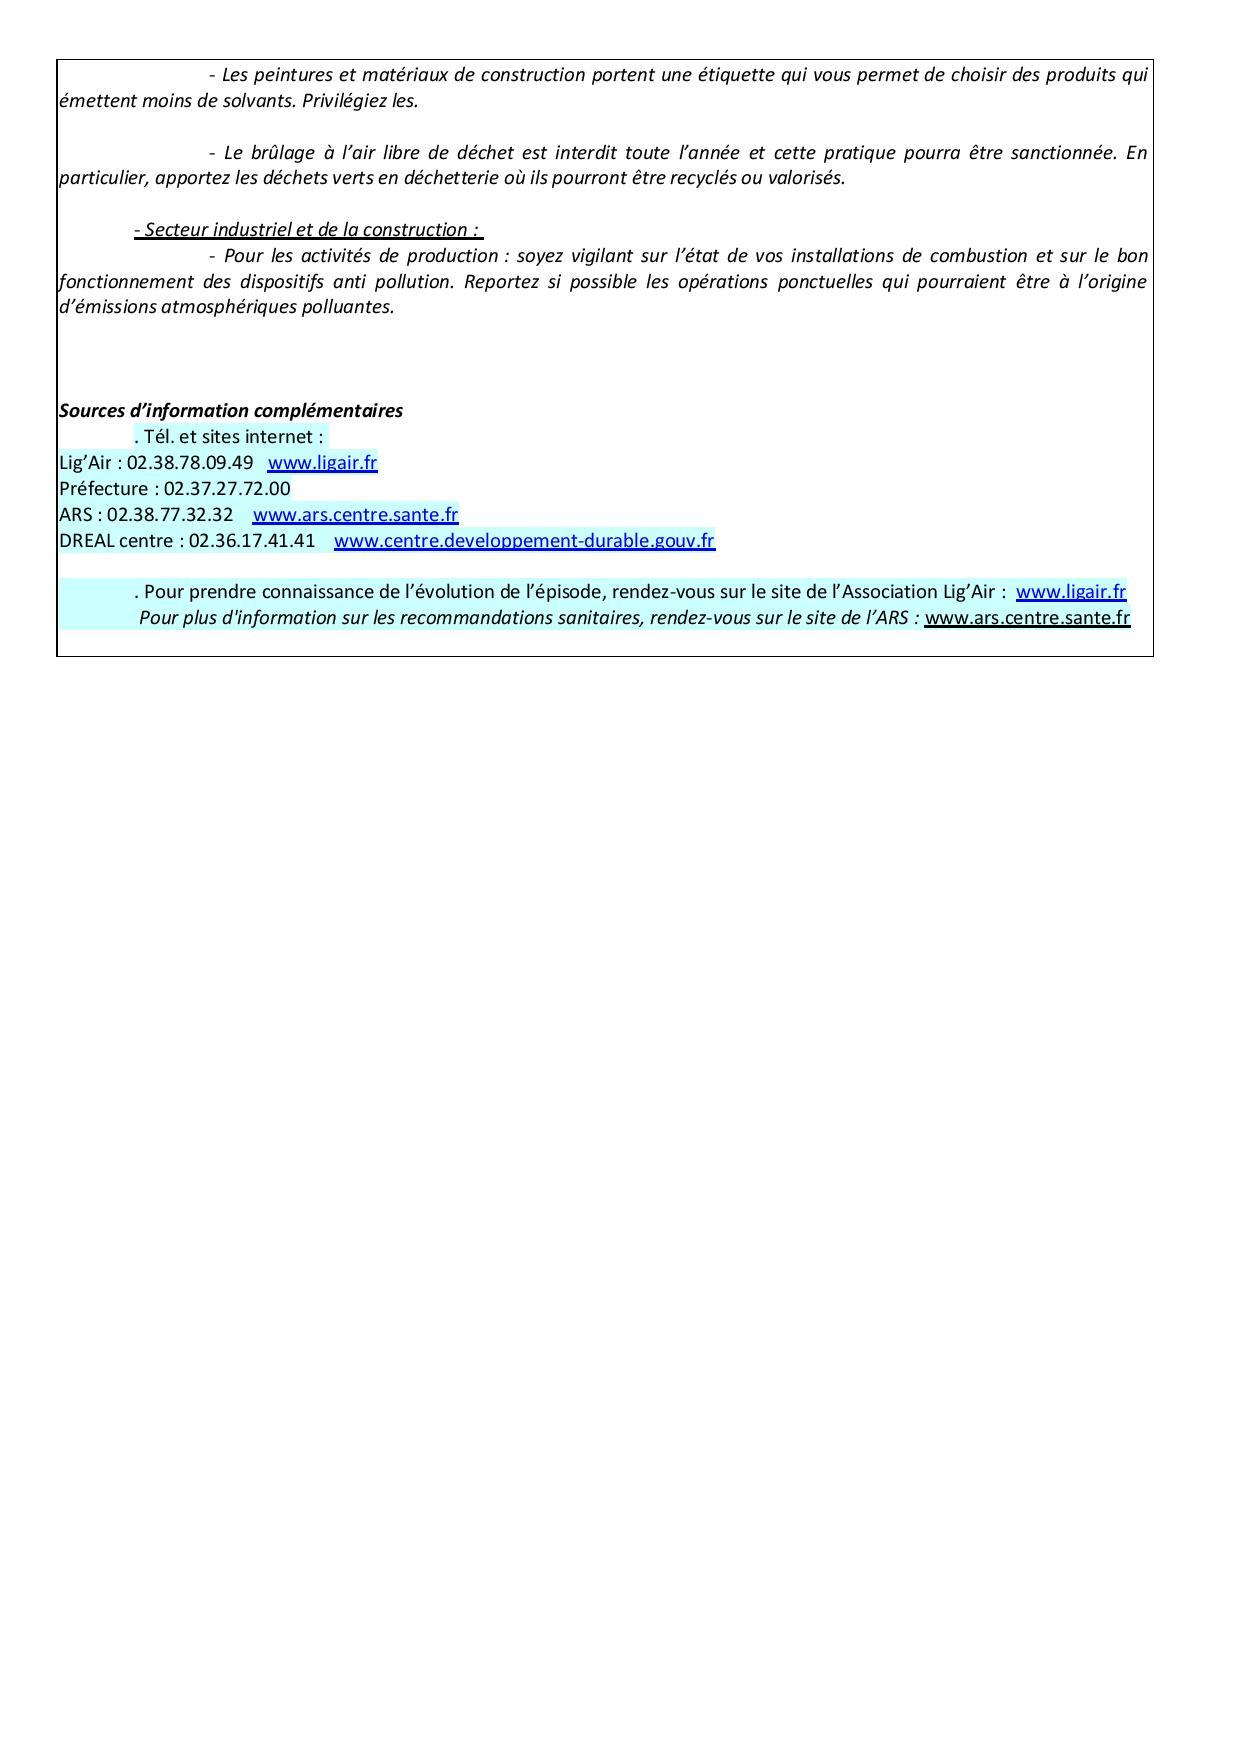 alerte-pollutin-atmosph-19-06-2017-p-2